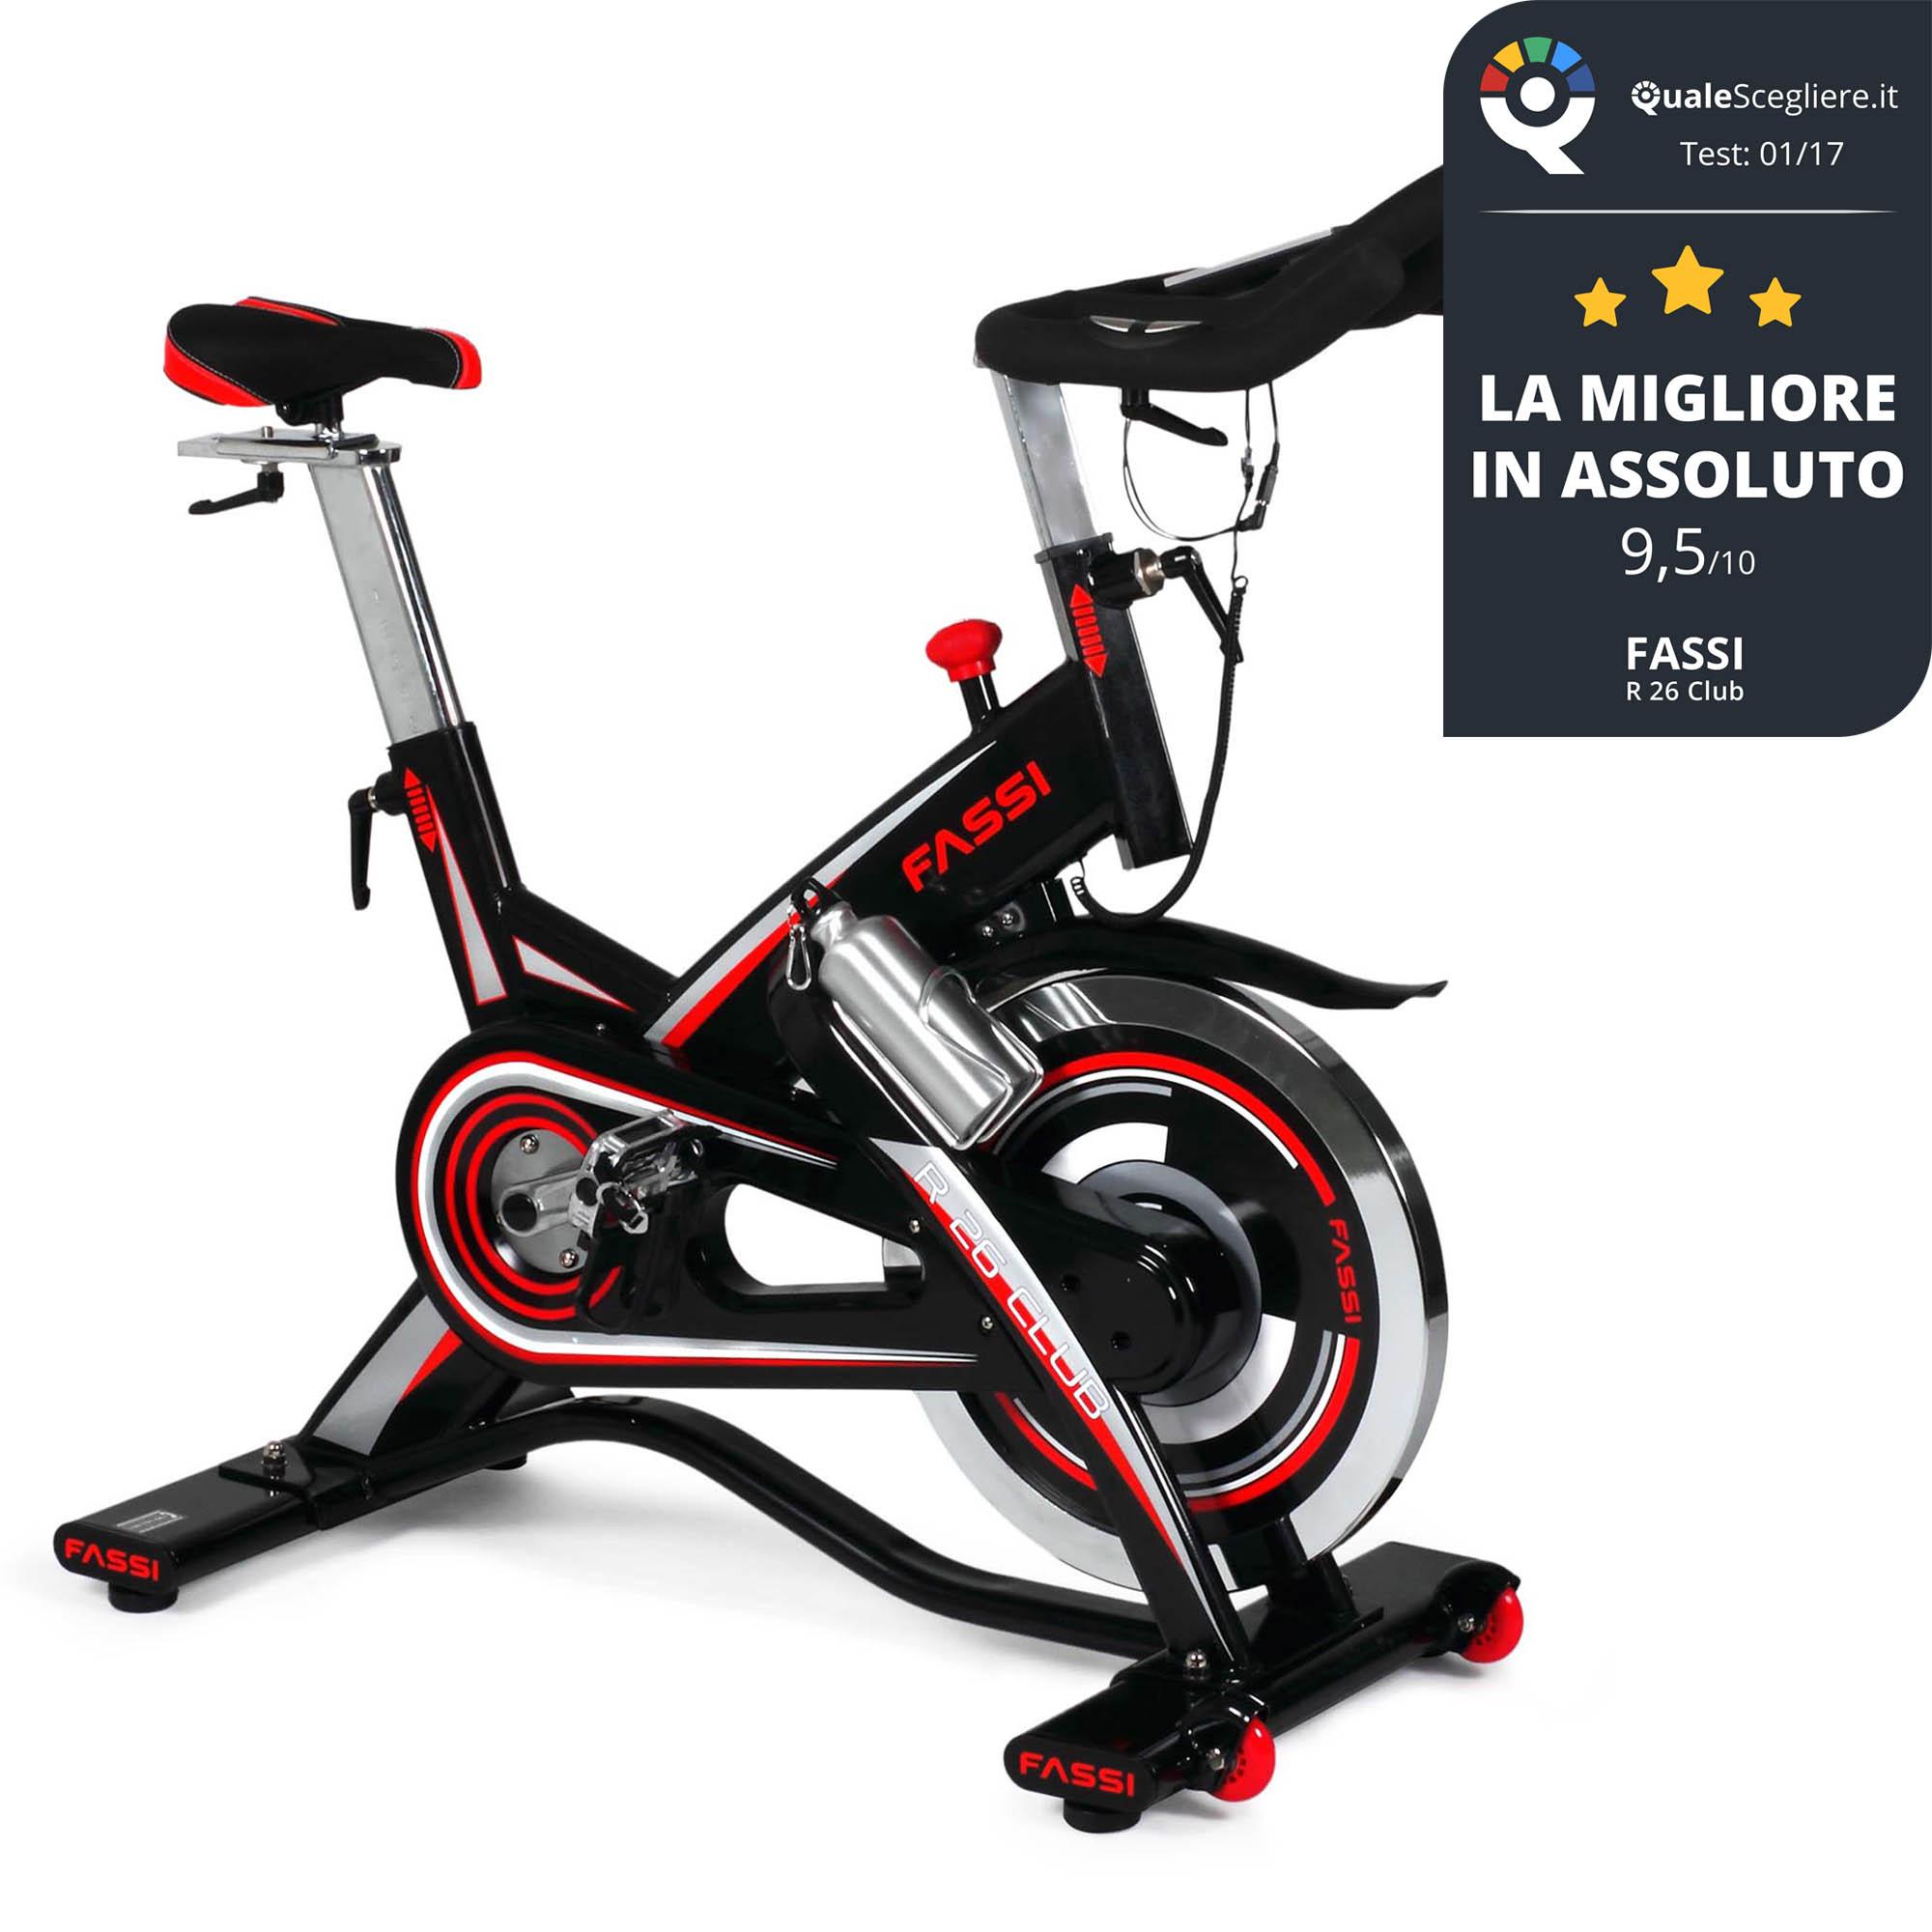 fassi fit bike r 26 club fassi